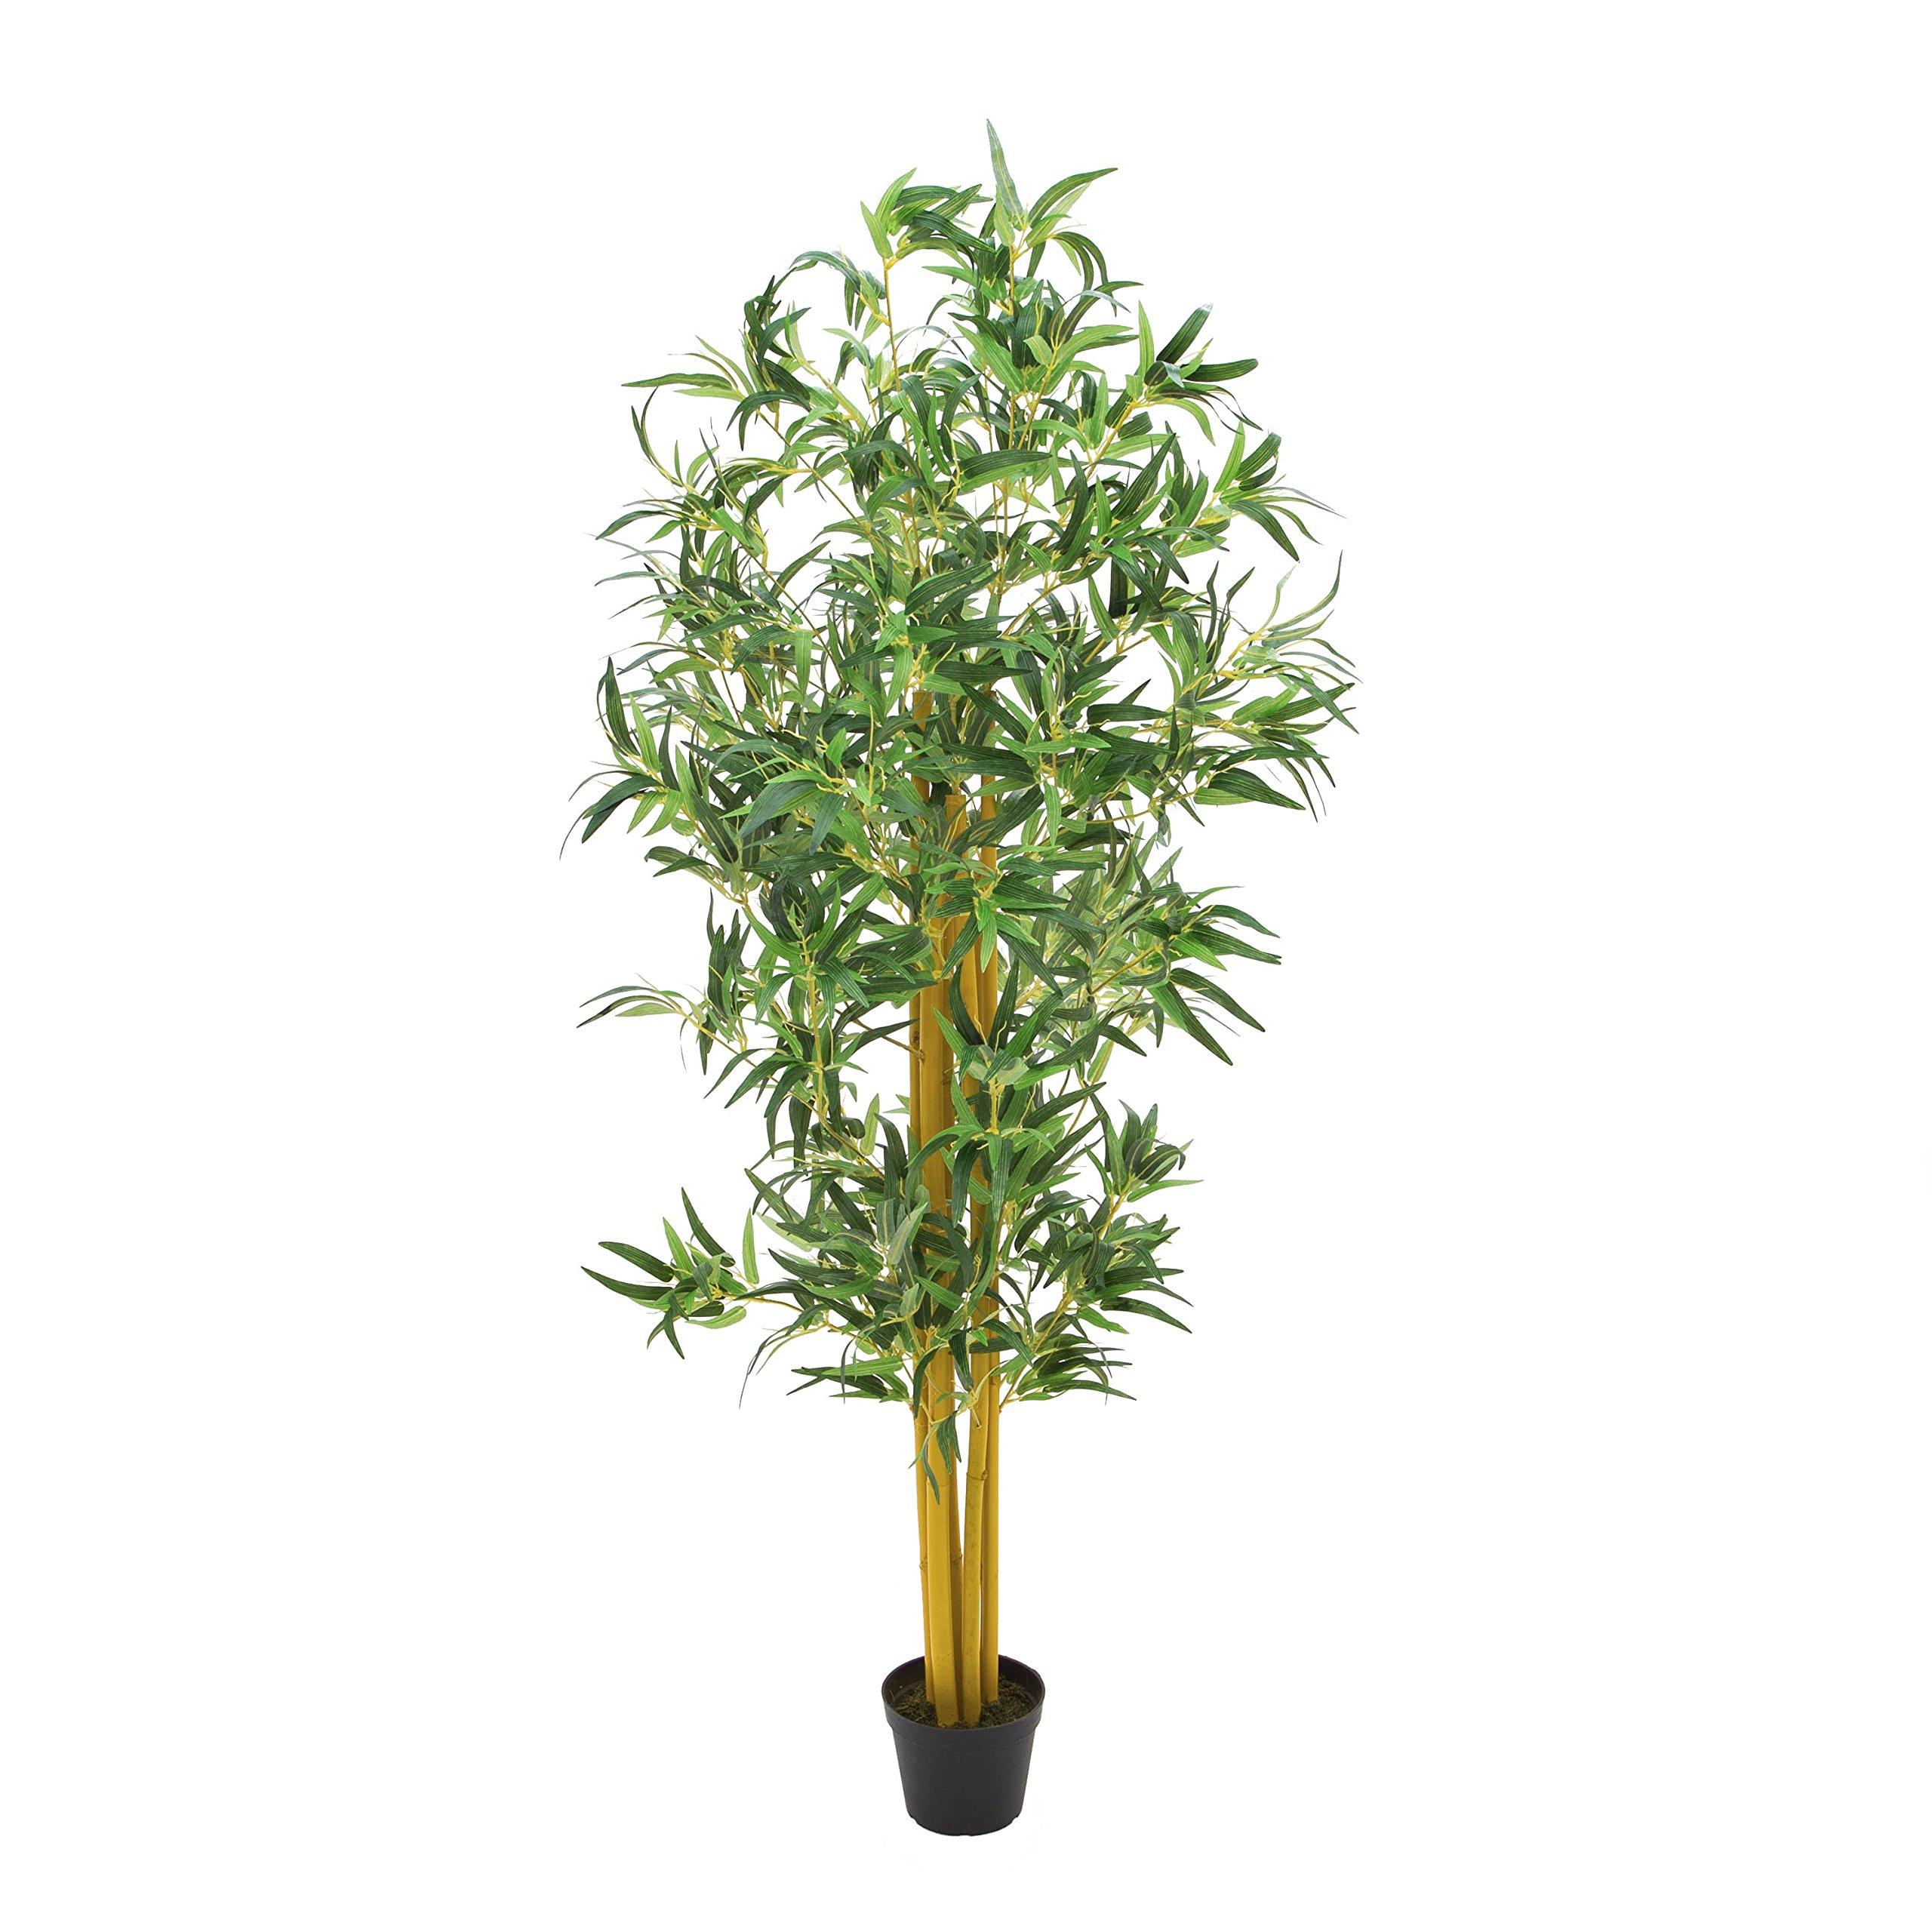 artplants.de Bambú Artificial con cañas Naturales, 180cm – Planta Artificial – árbol sintético